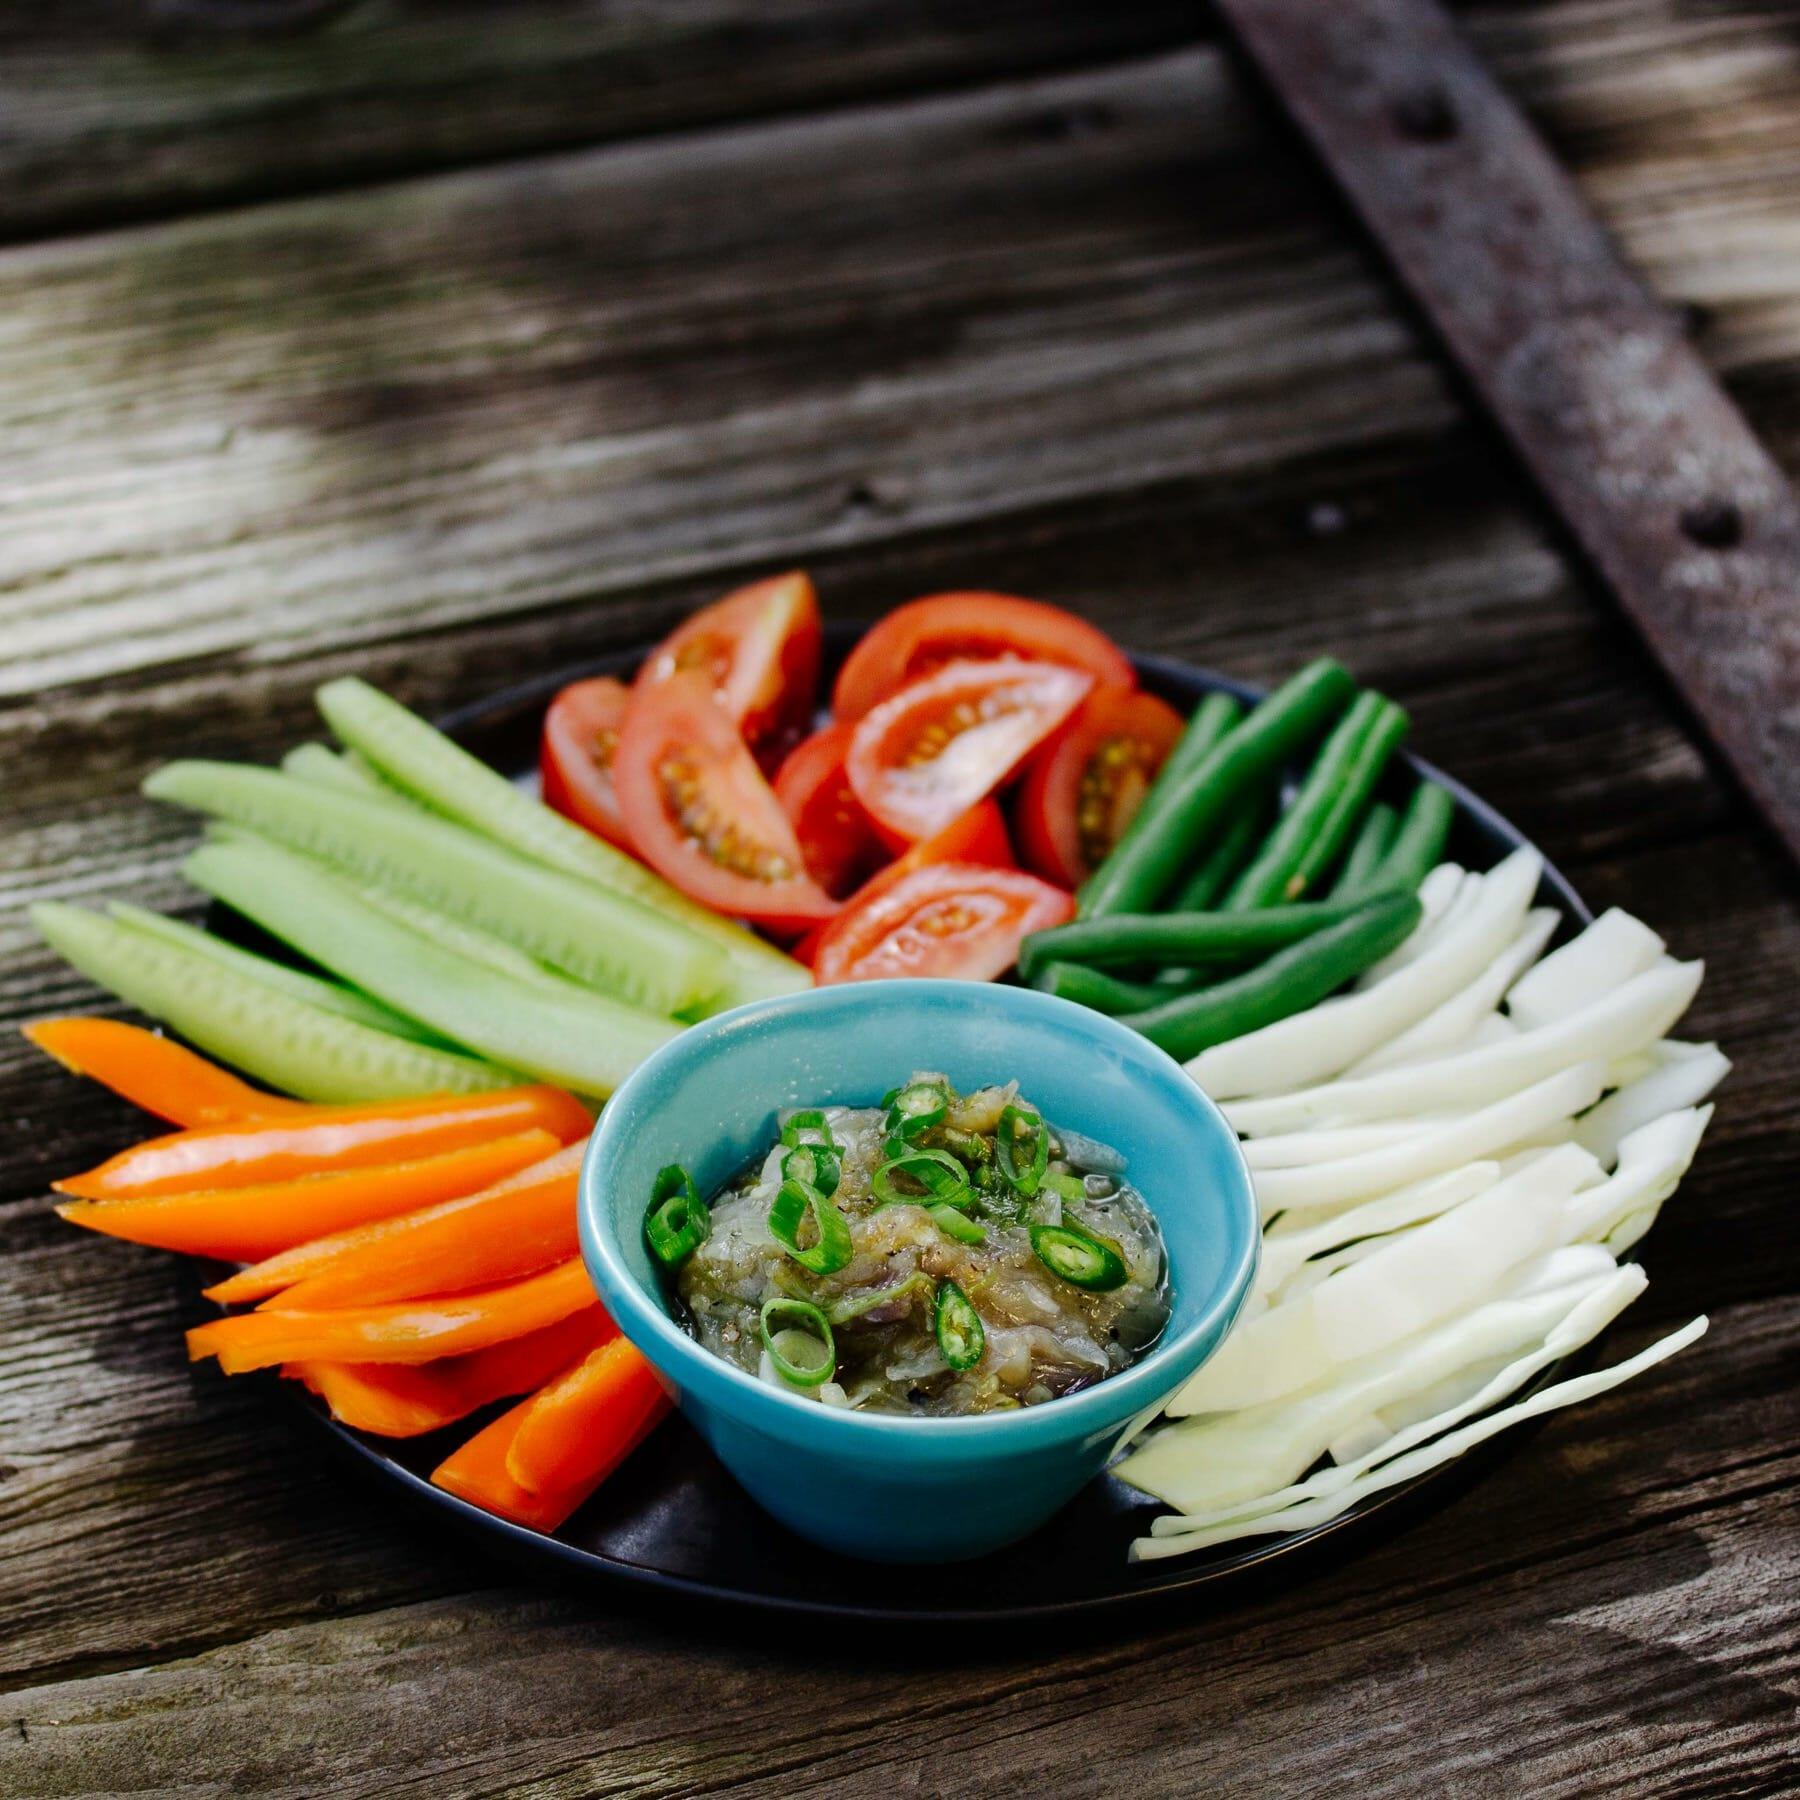 Gegrillter Chili Dip mit rohem Gemüse - Nam Prik Num